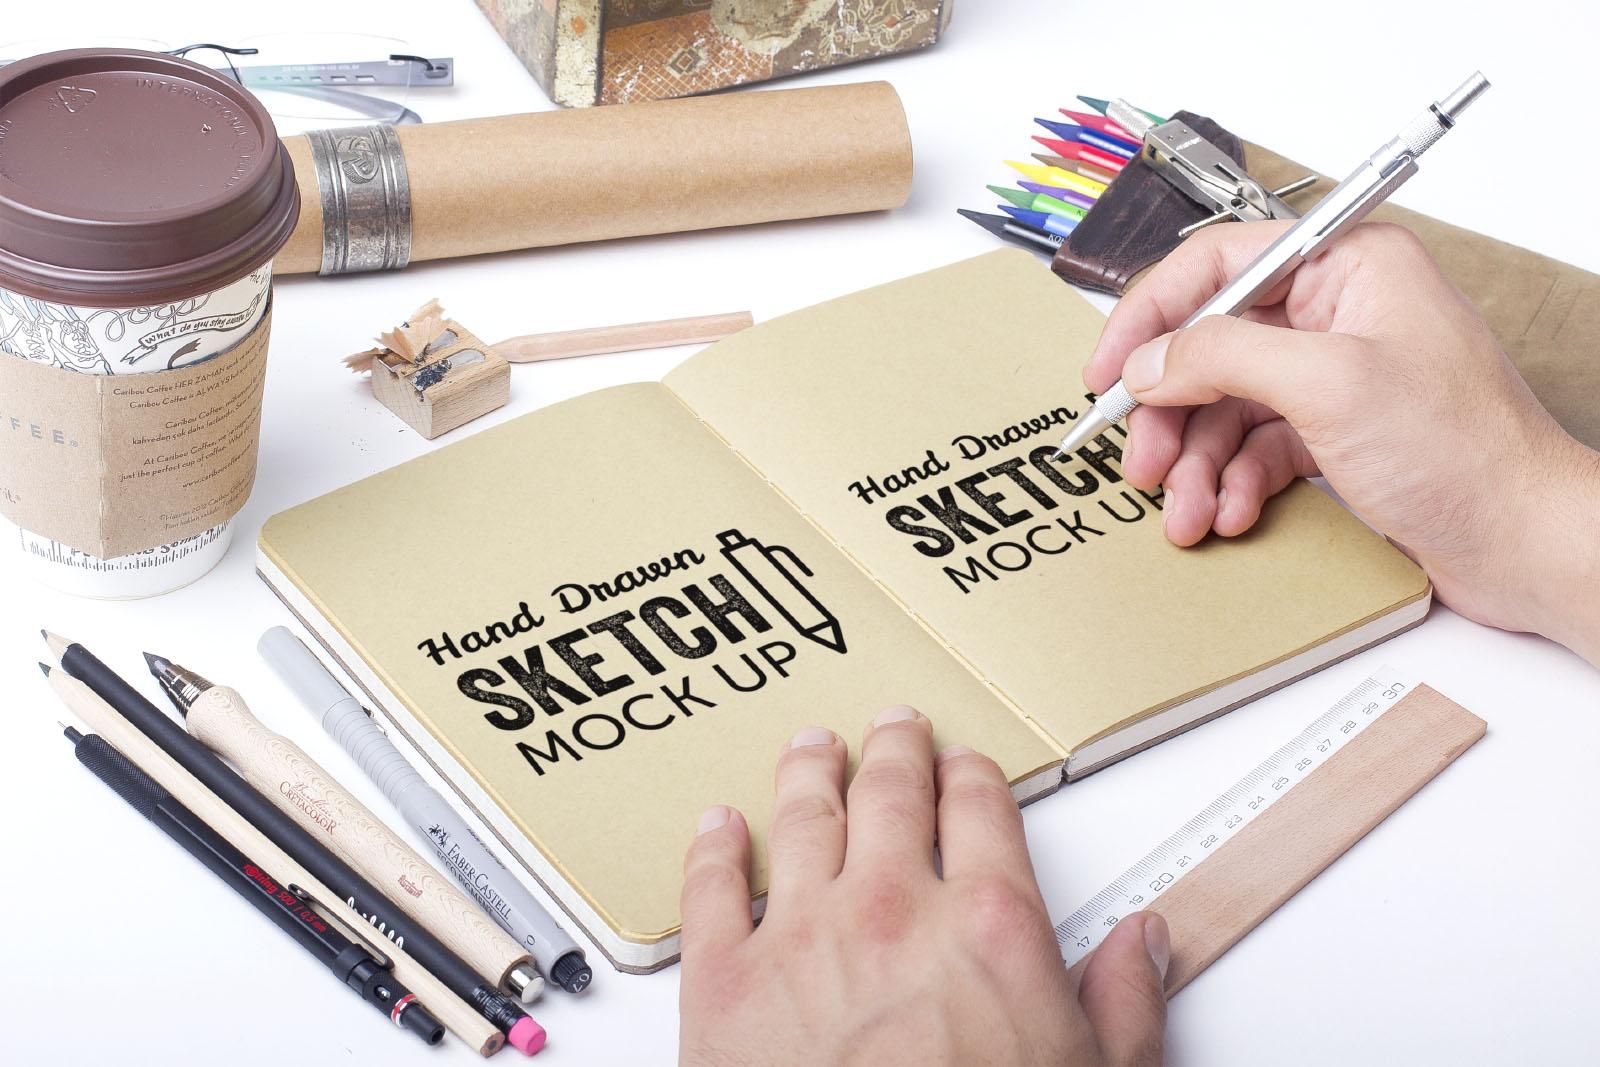 Hand Drawn Sketch Book & Paper Mockup